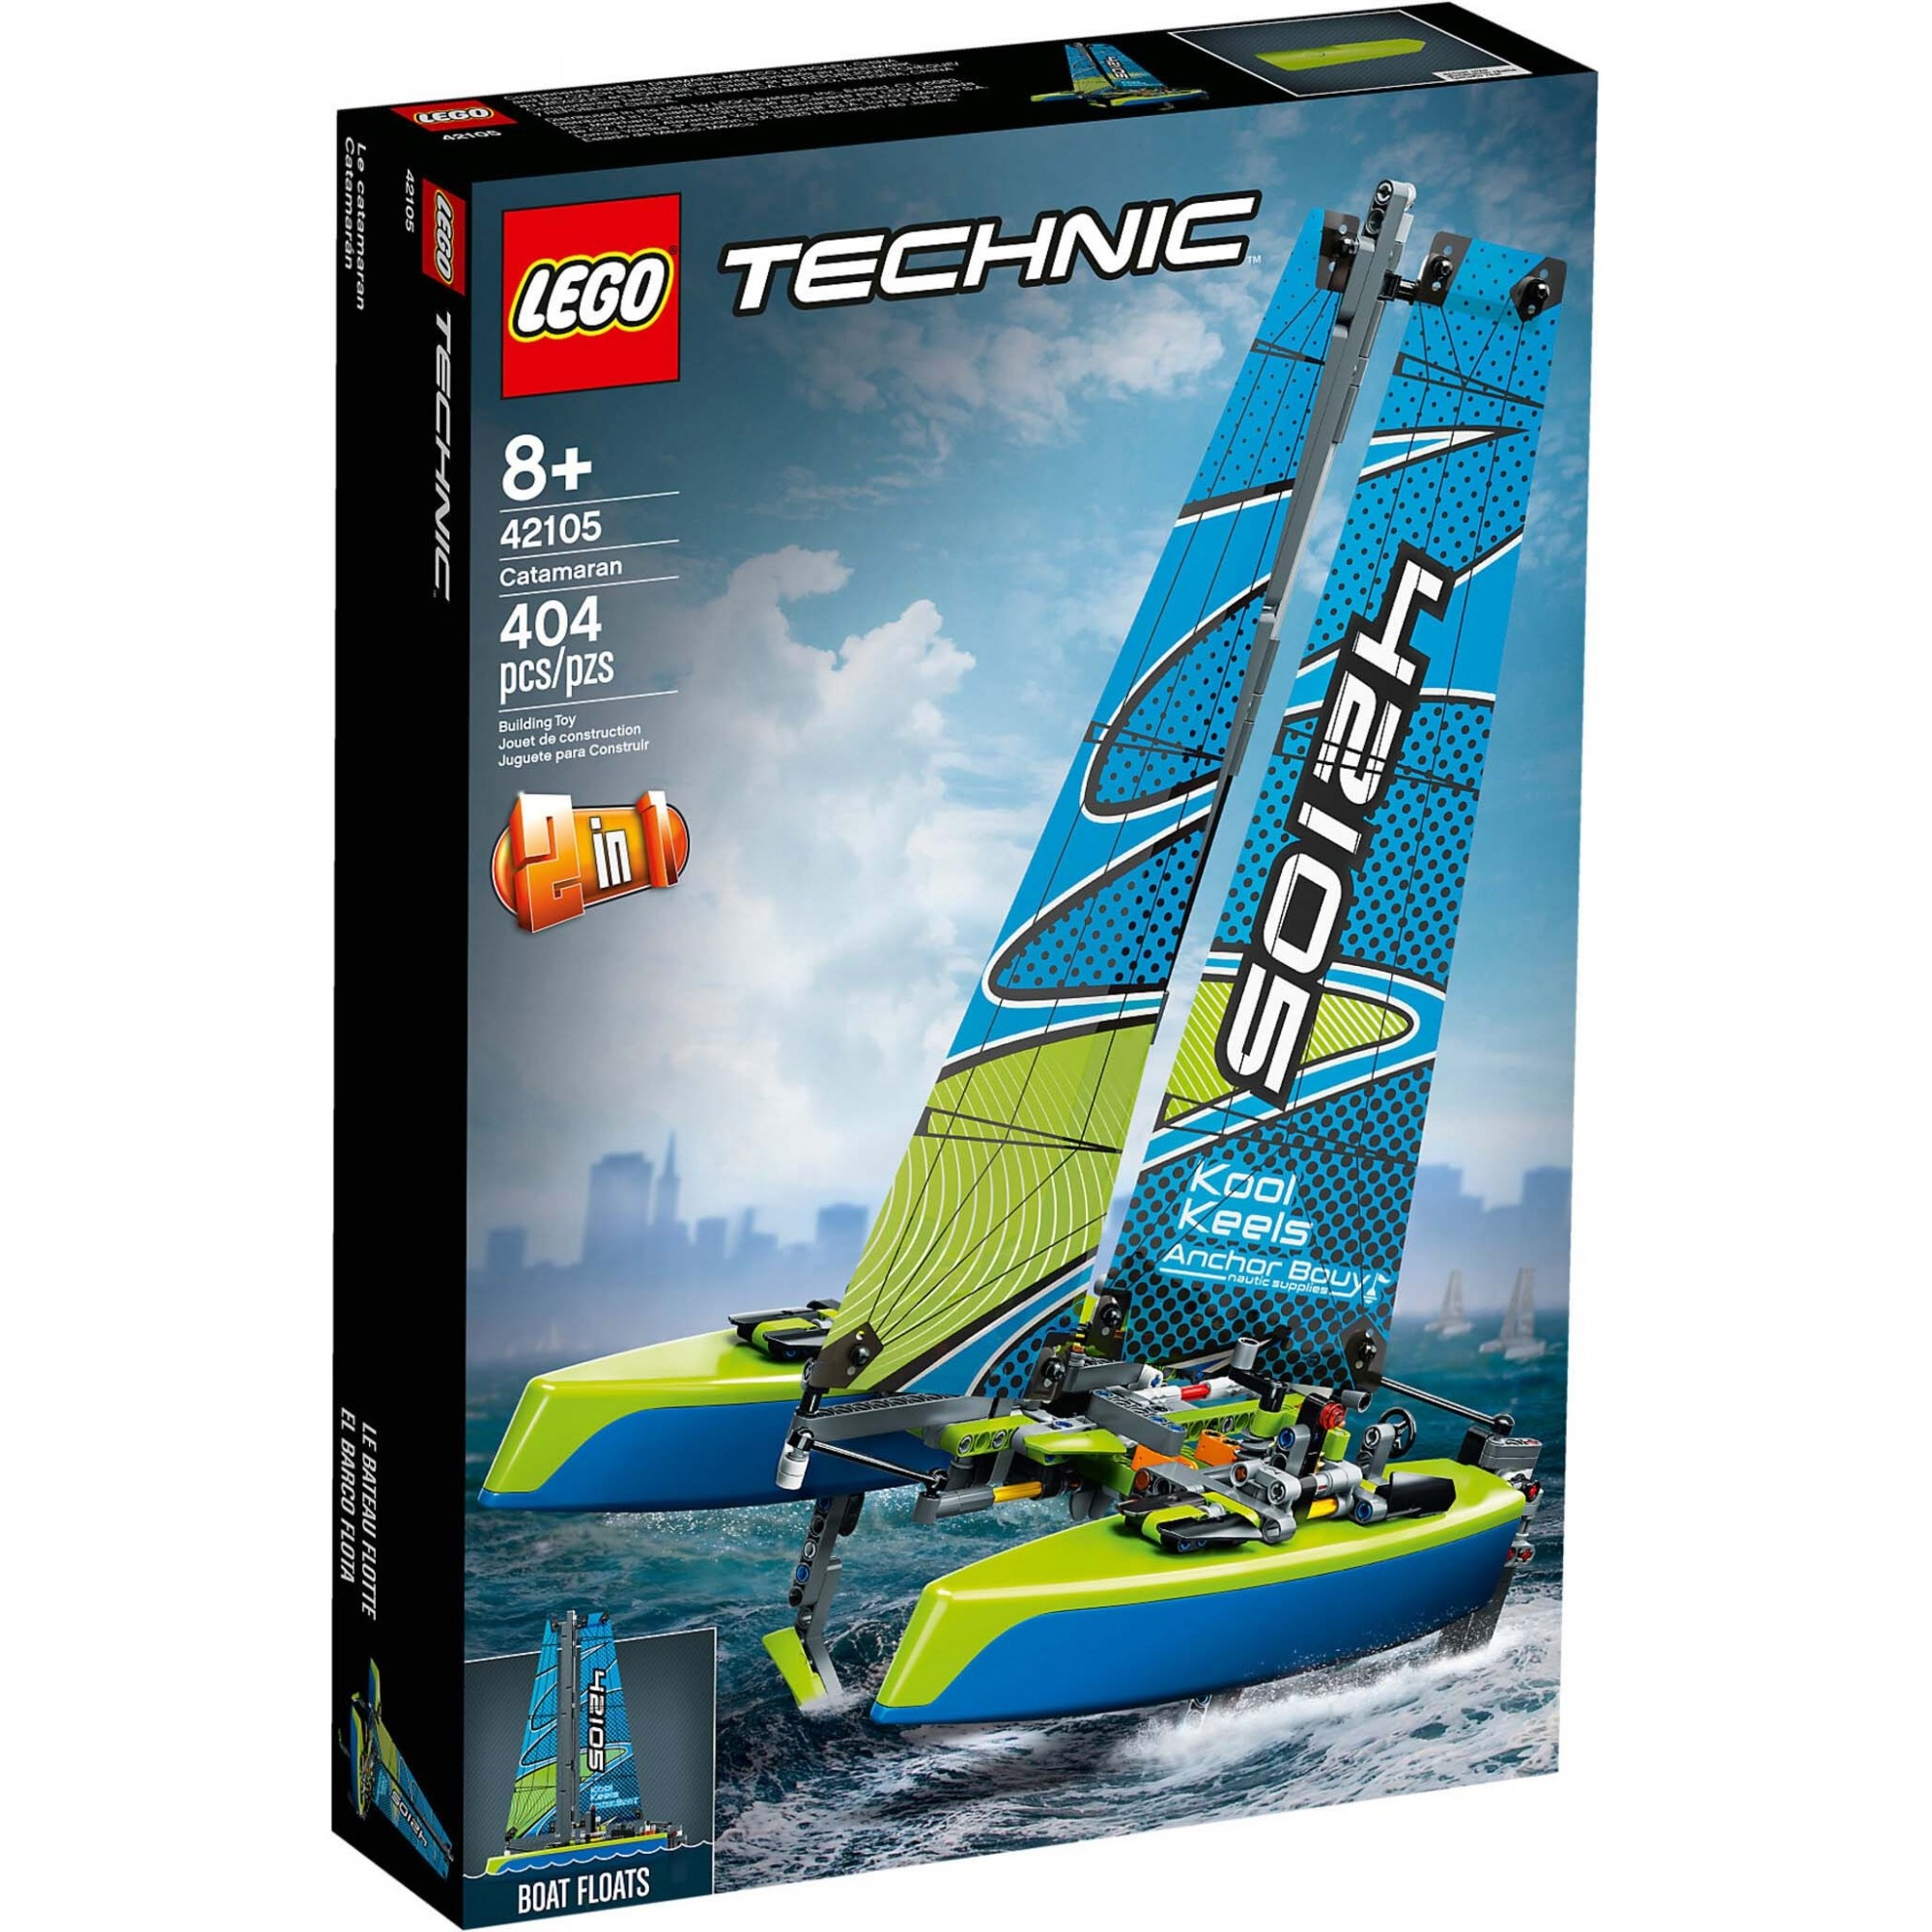 LEGO Technic - Catamarã 42105